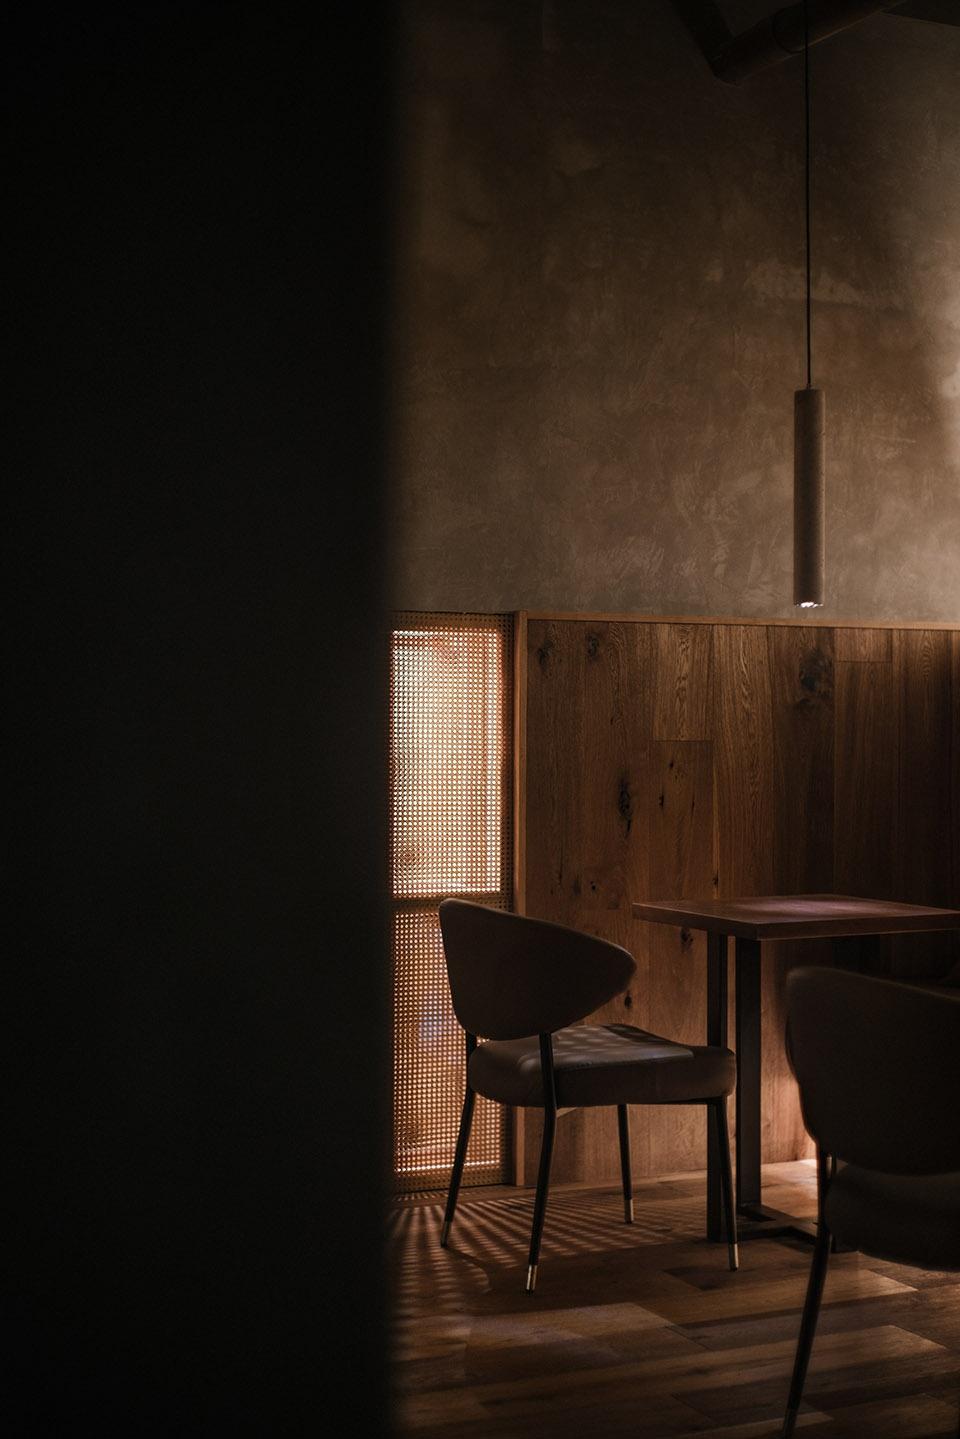 012-the-tasting-room-china-by-ge-studio-960x1439.jpg